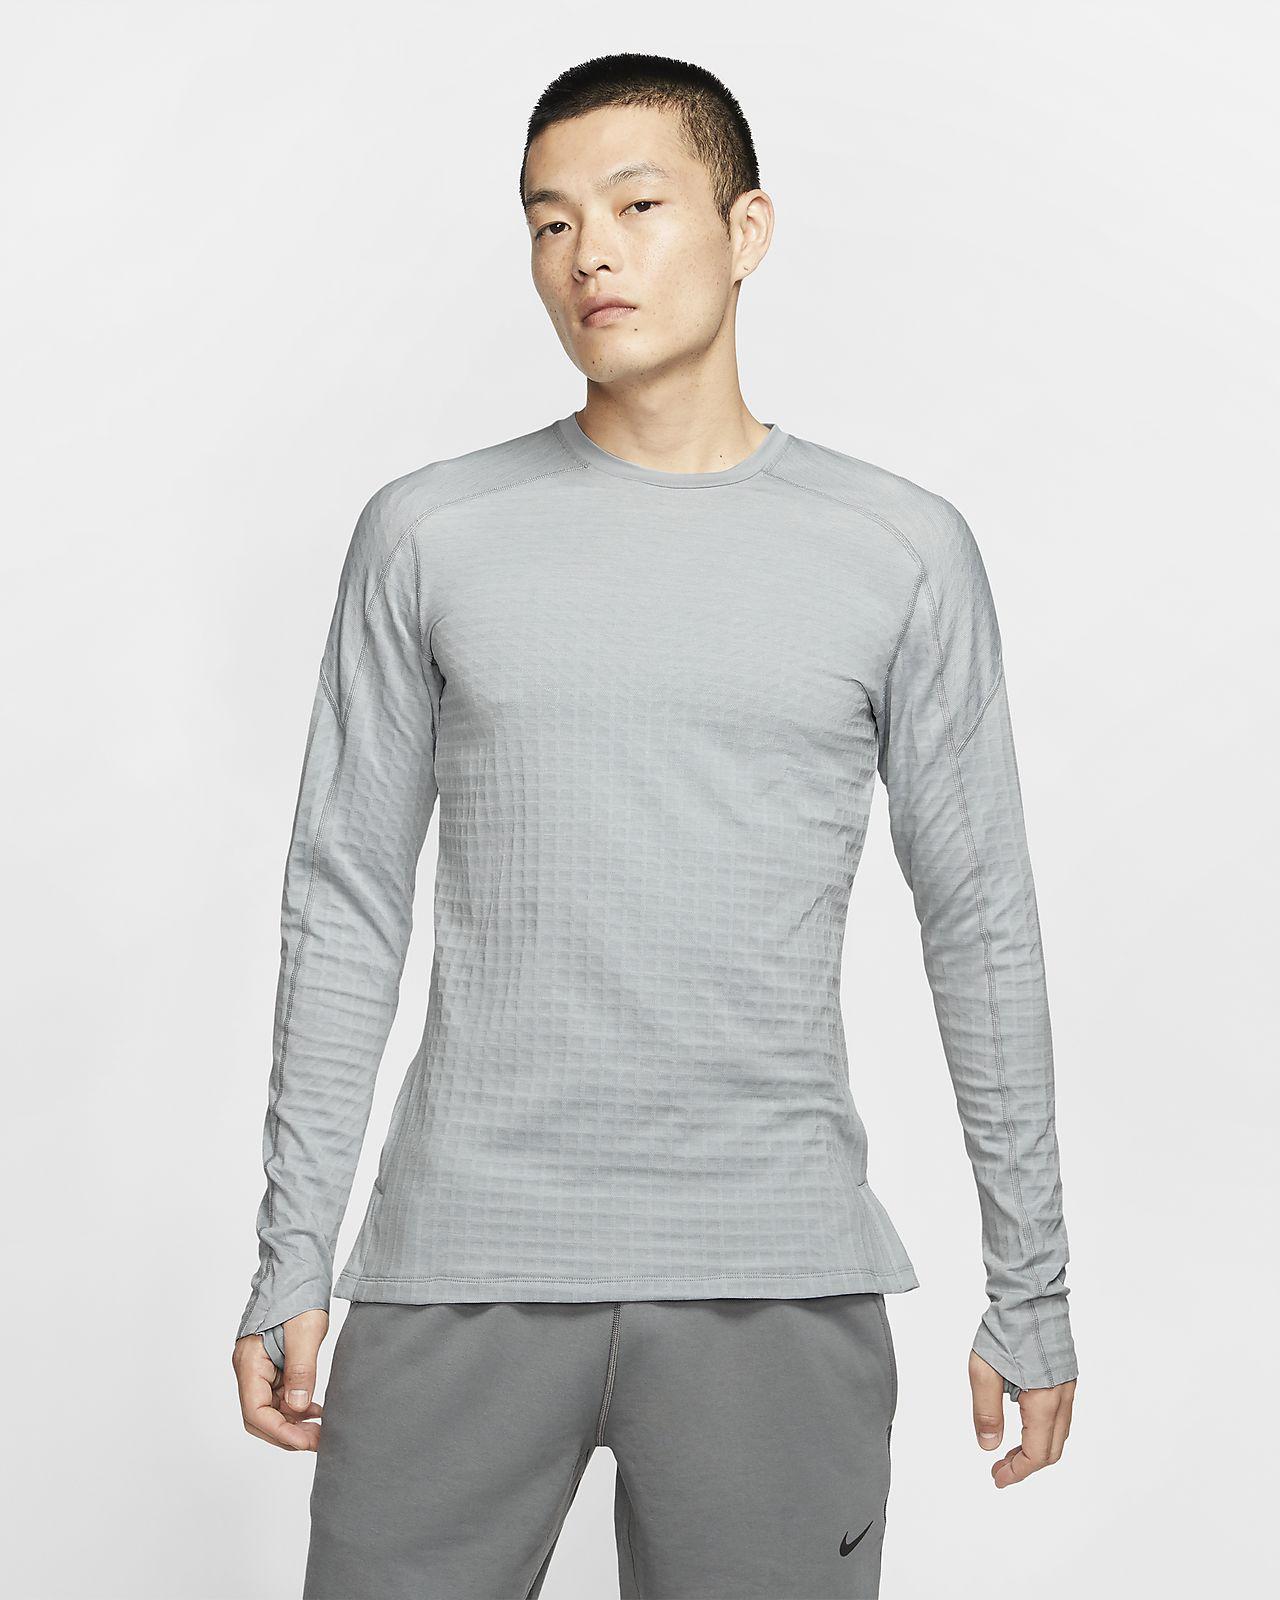 Prenda para la parte superior de manga larga para hombre Nike Pro Tech Pack